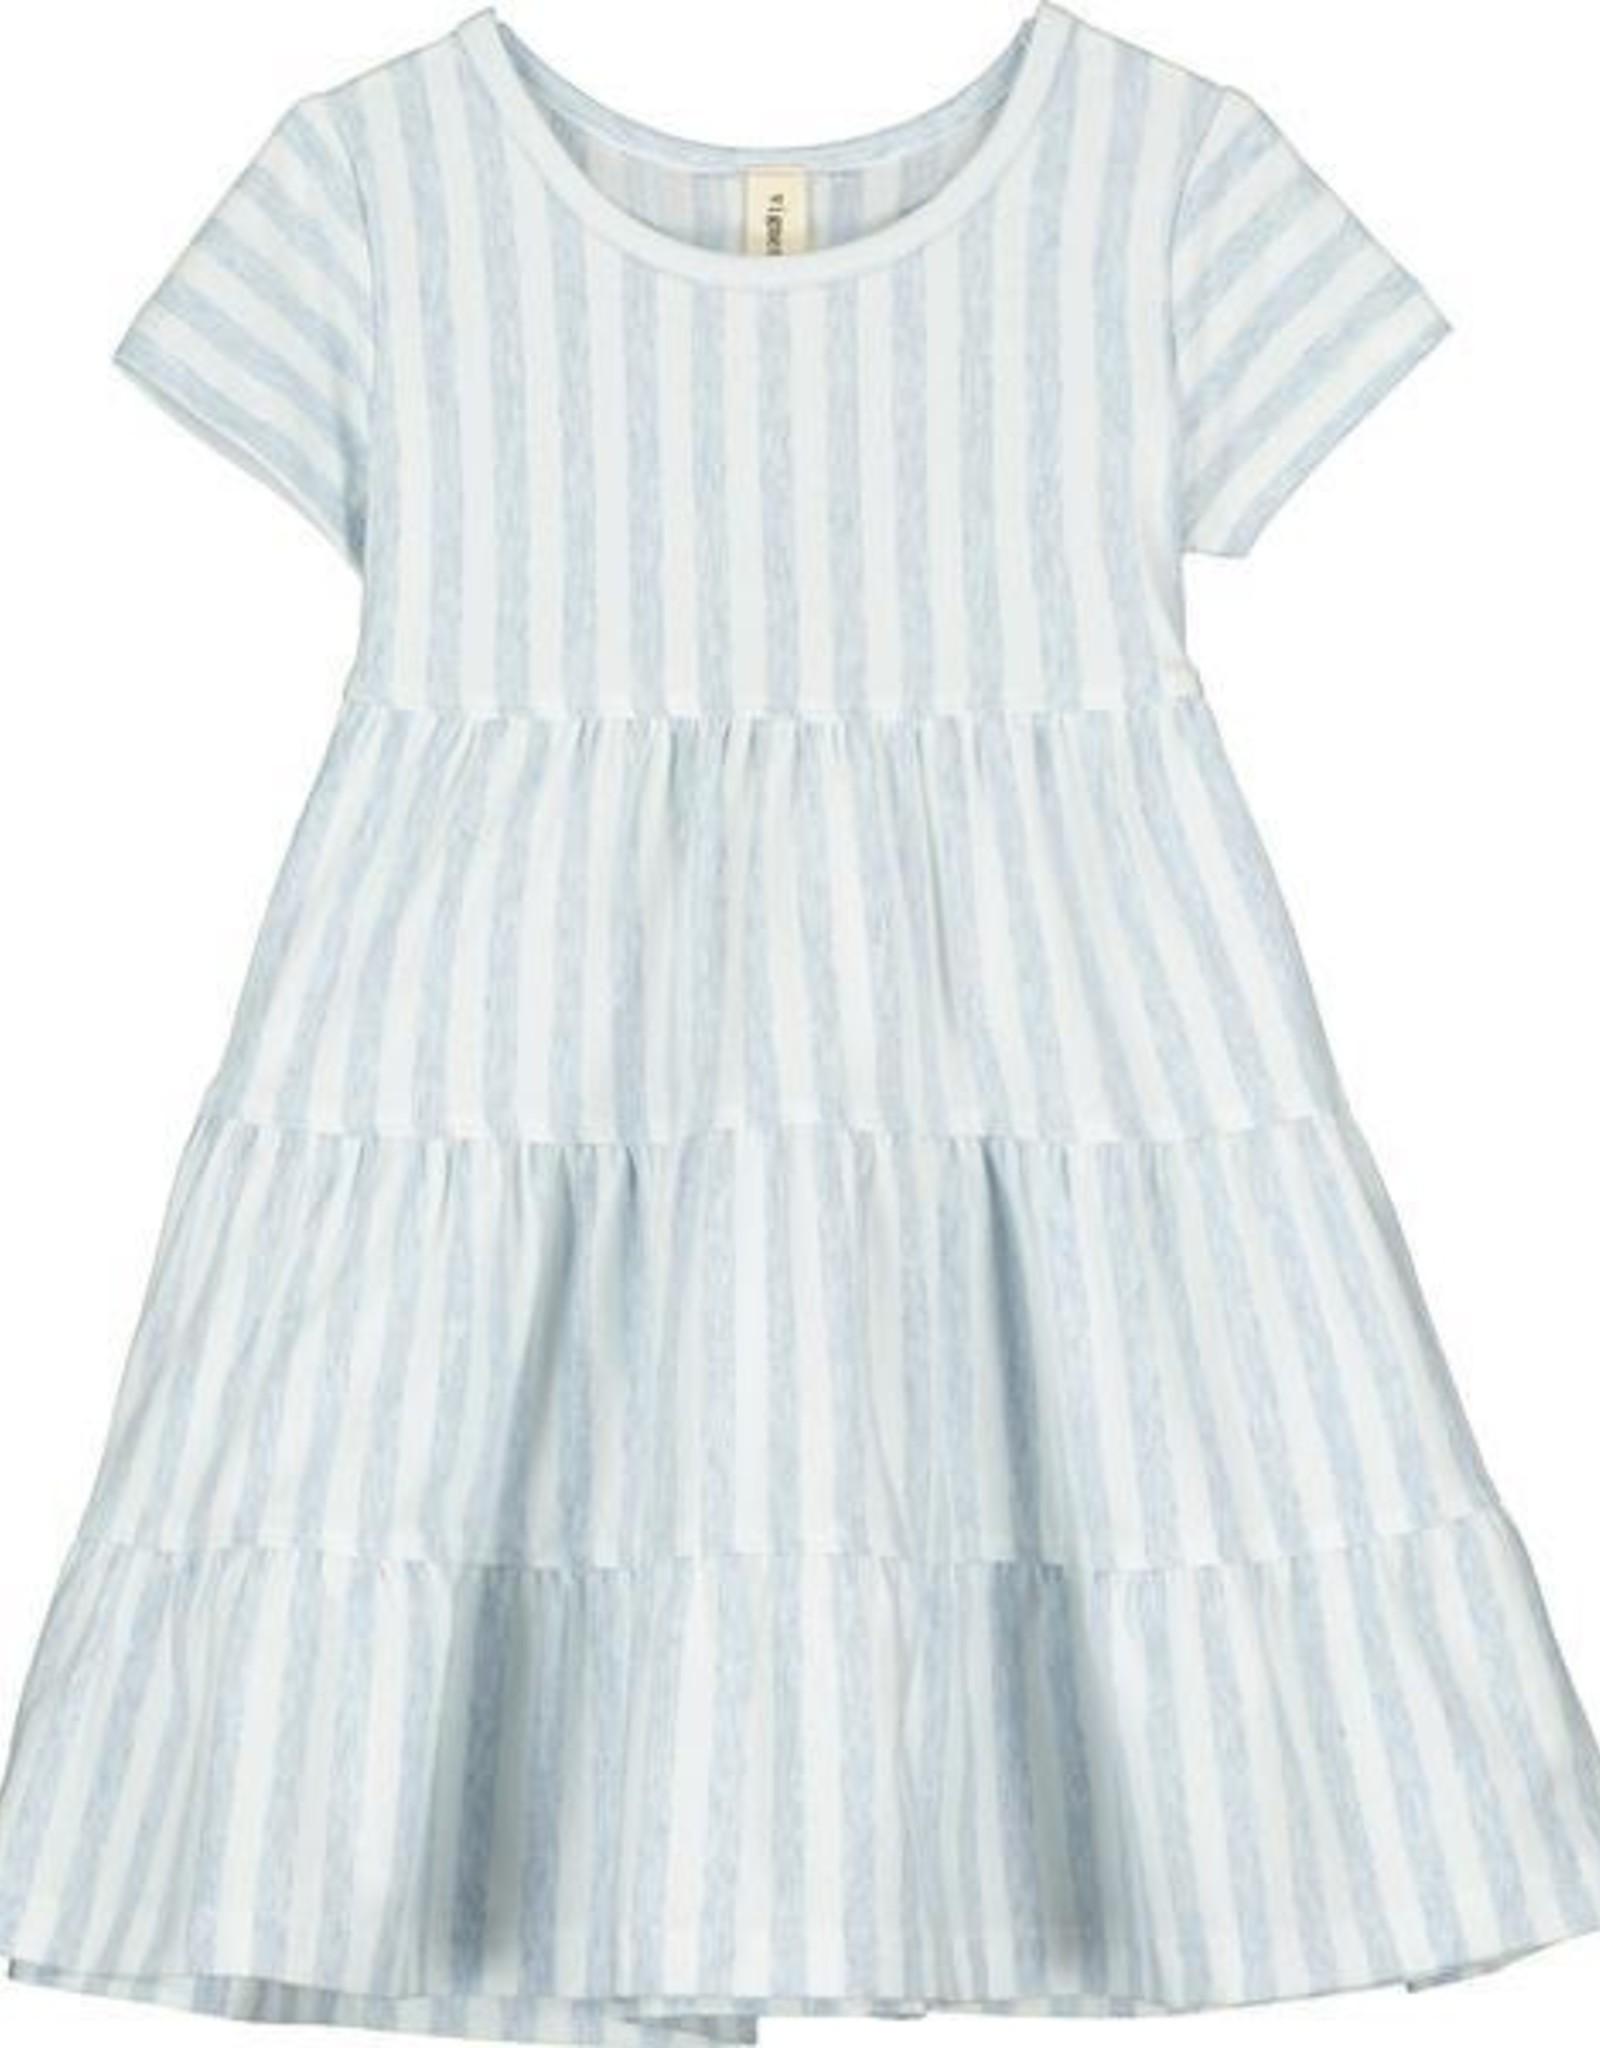 Vignette Blue Iona Dress